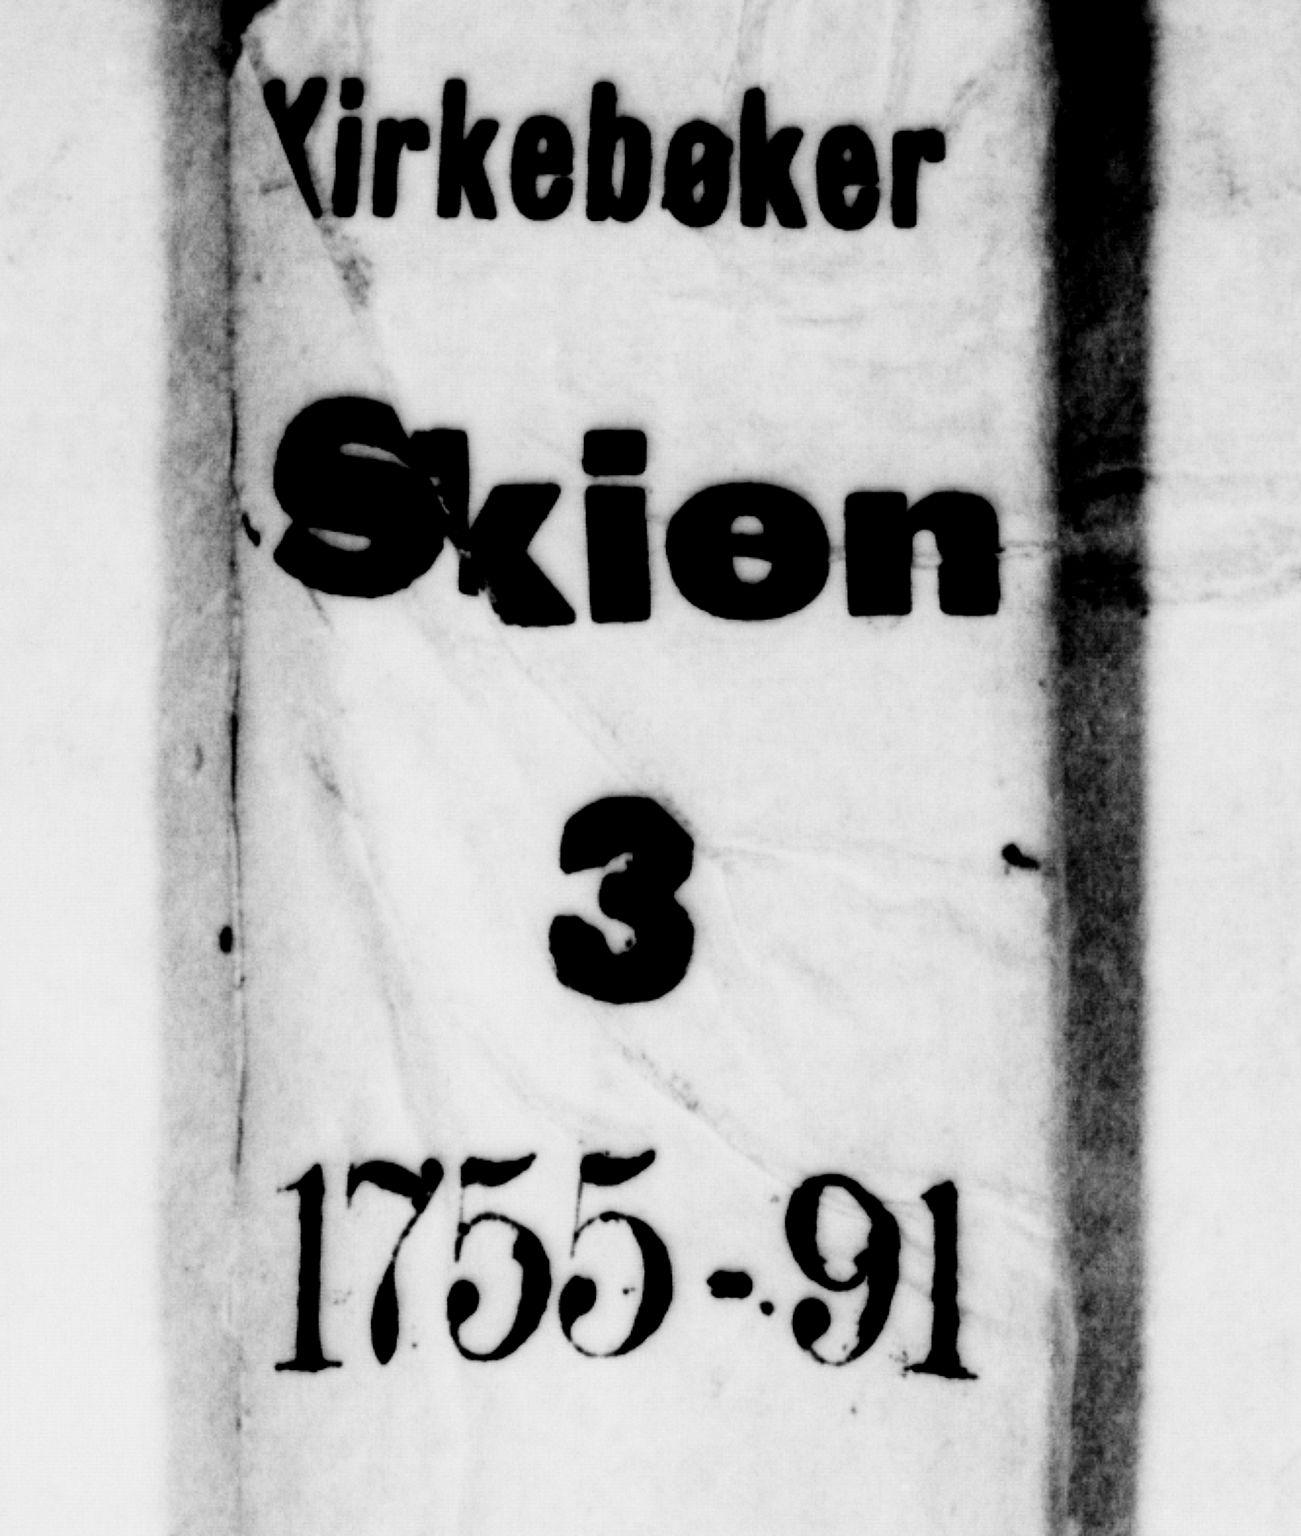 SAKO, Skien kirkebøker, G/Ga/L0001: Klokkerbok nr. 1, 1756-1791